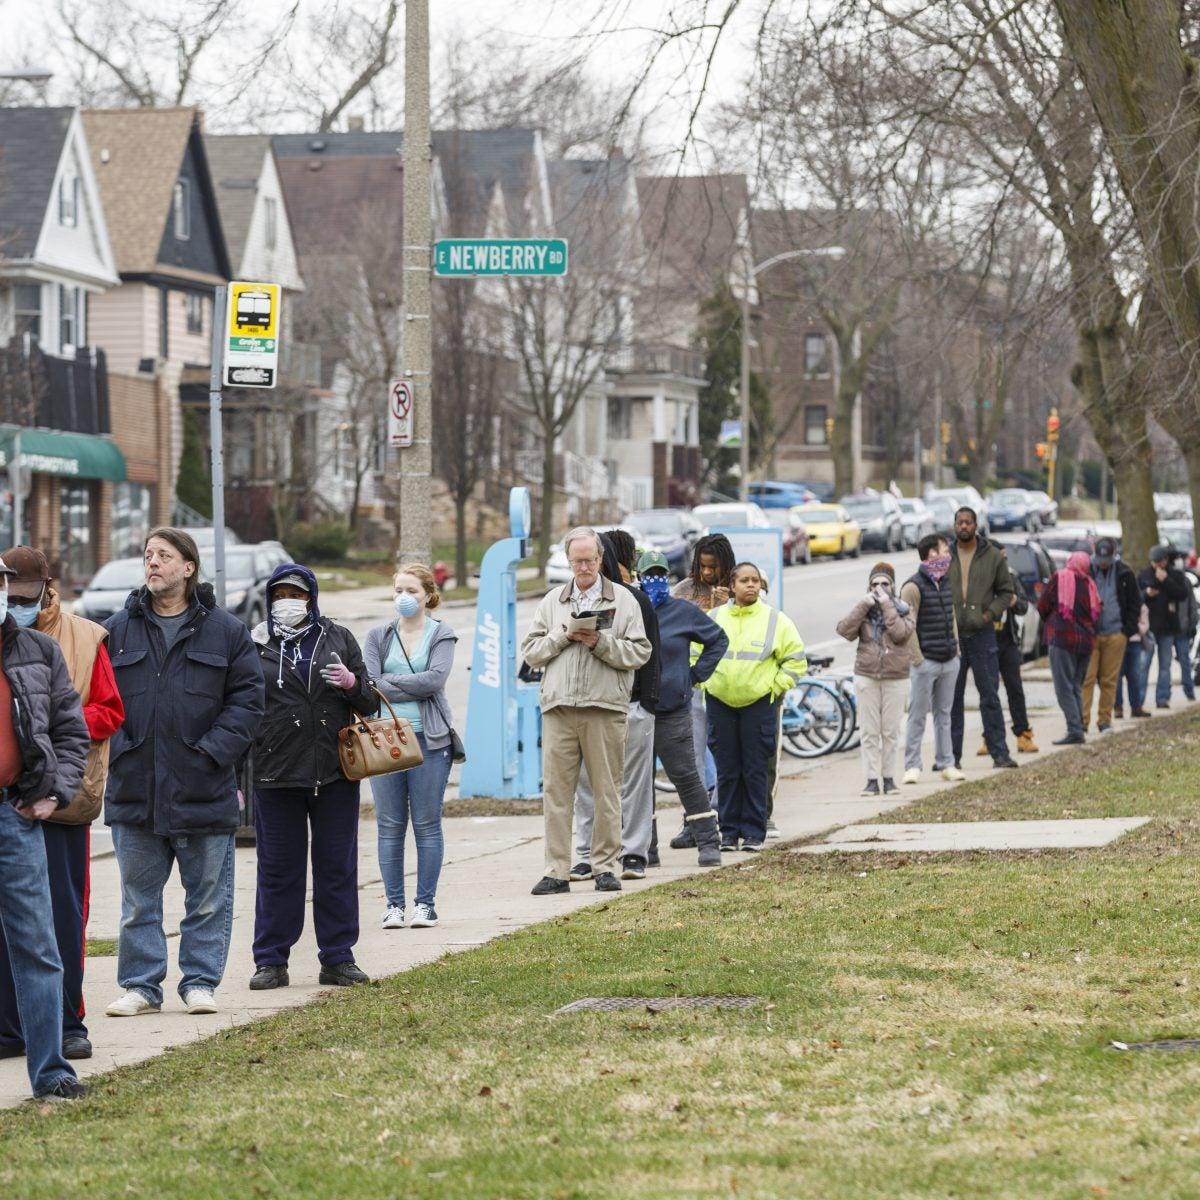 Wisconsin Held Its Primary Despite The Coronavirus Pandemic, Black Voters Describe The Impact